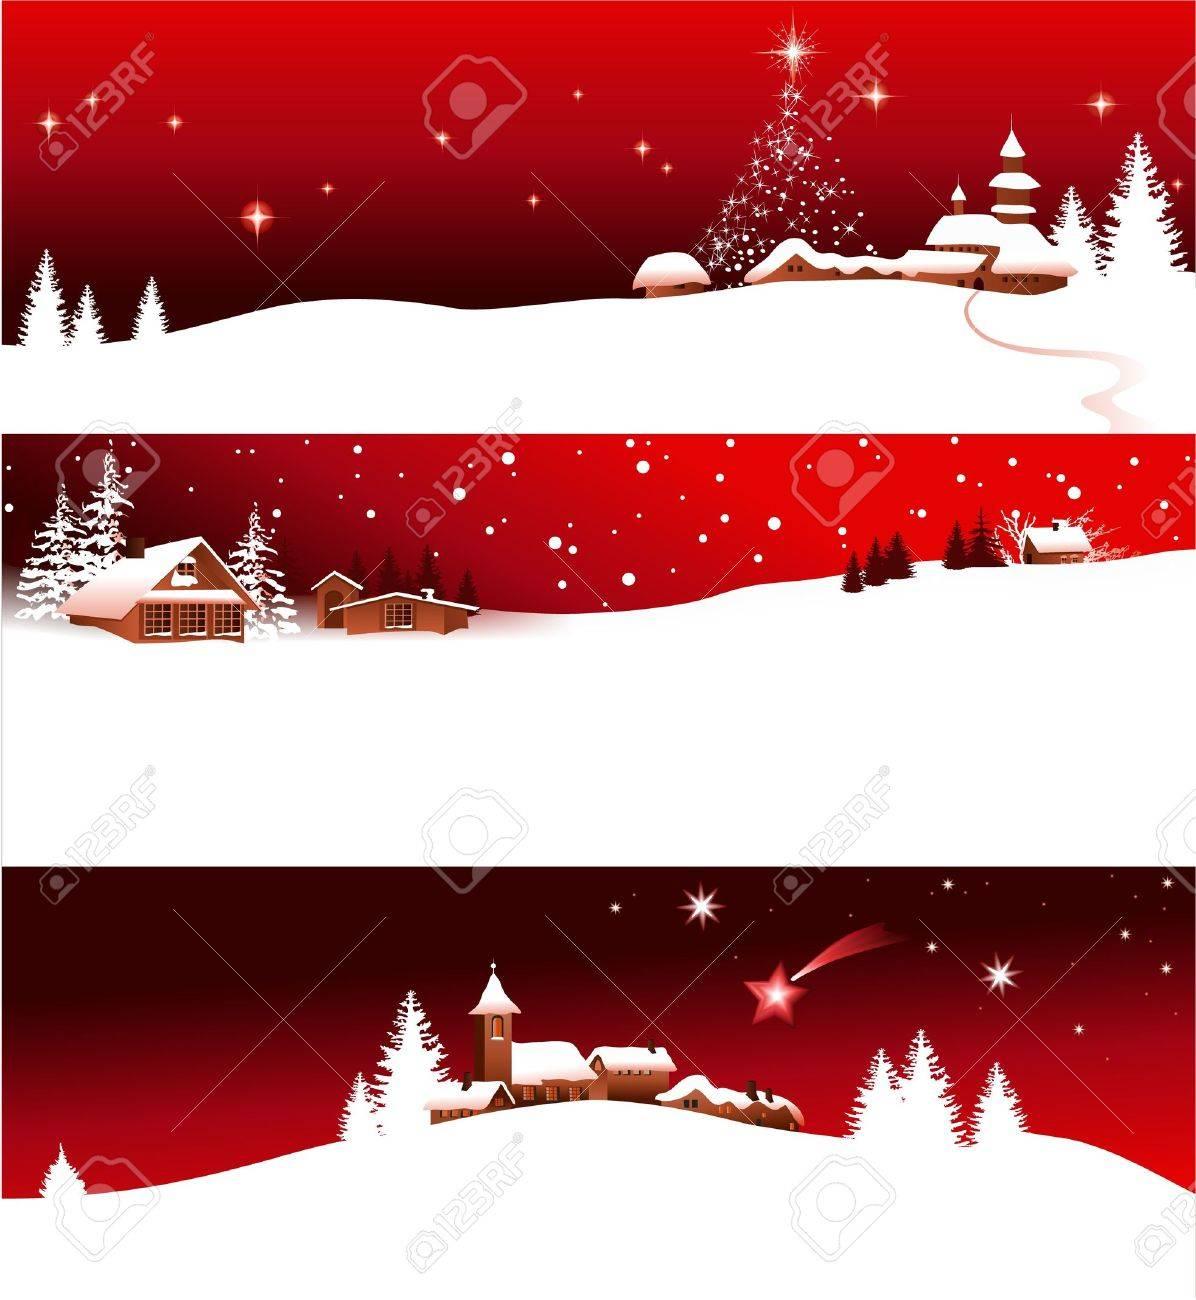 Christmas banners Stock Vector - 14020249